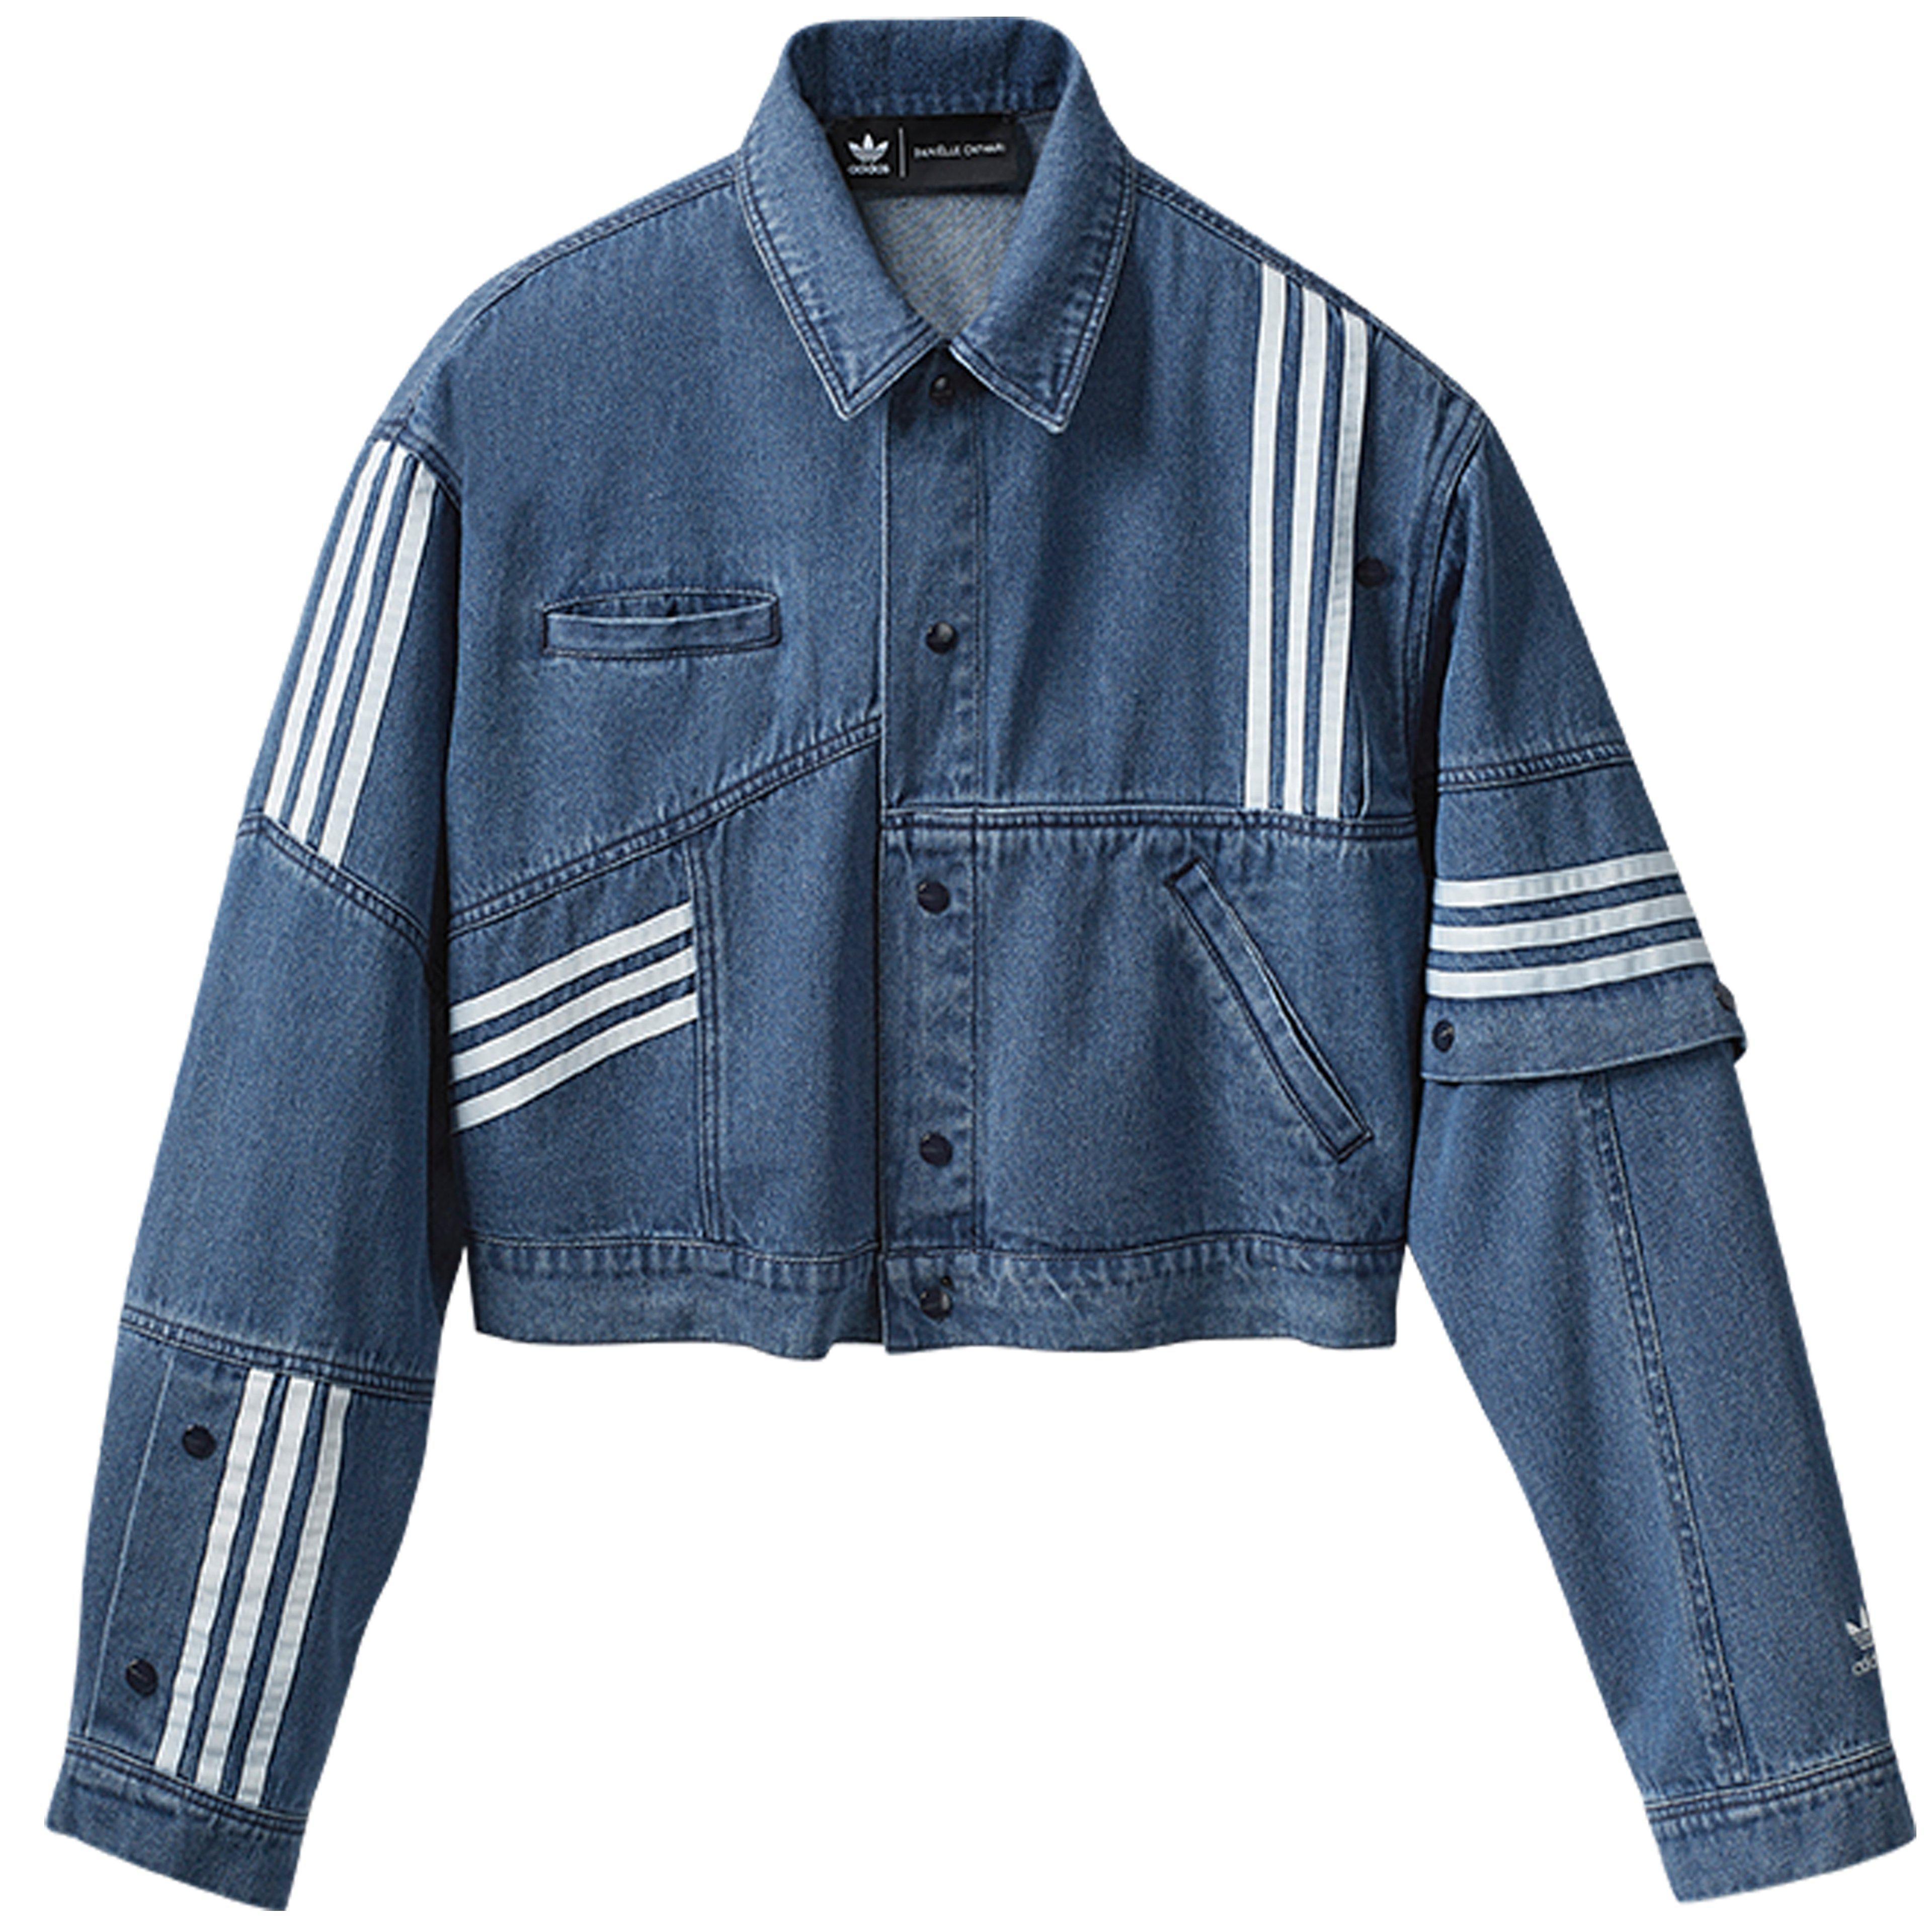 50b97df9a8 Lyst - adidas Danielle Cathari Collection Denim Jacket in Blue for Men